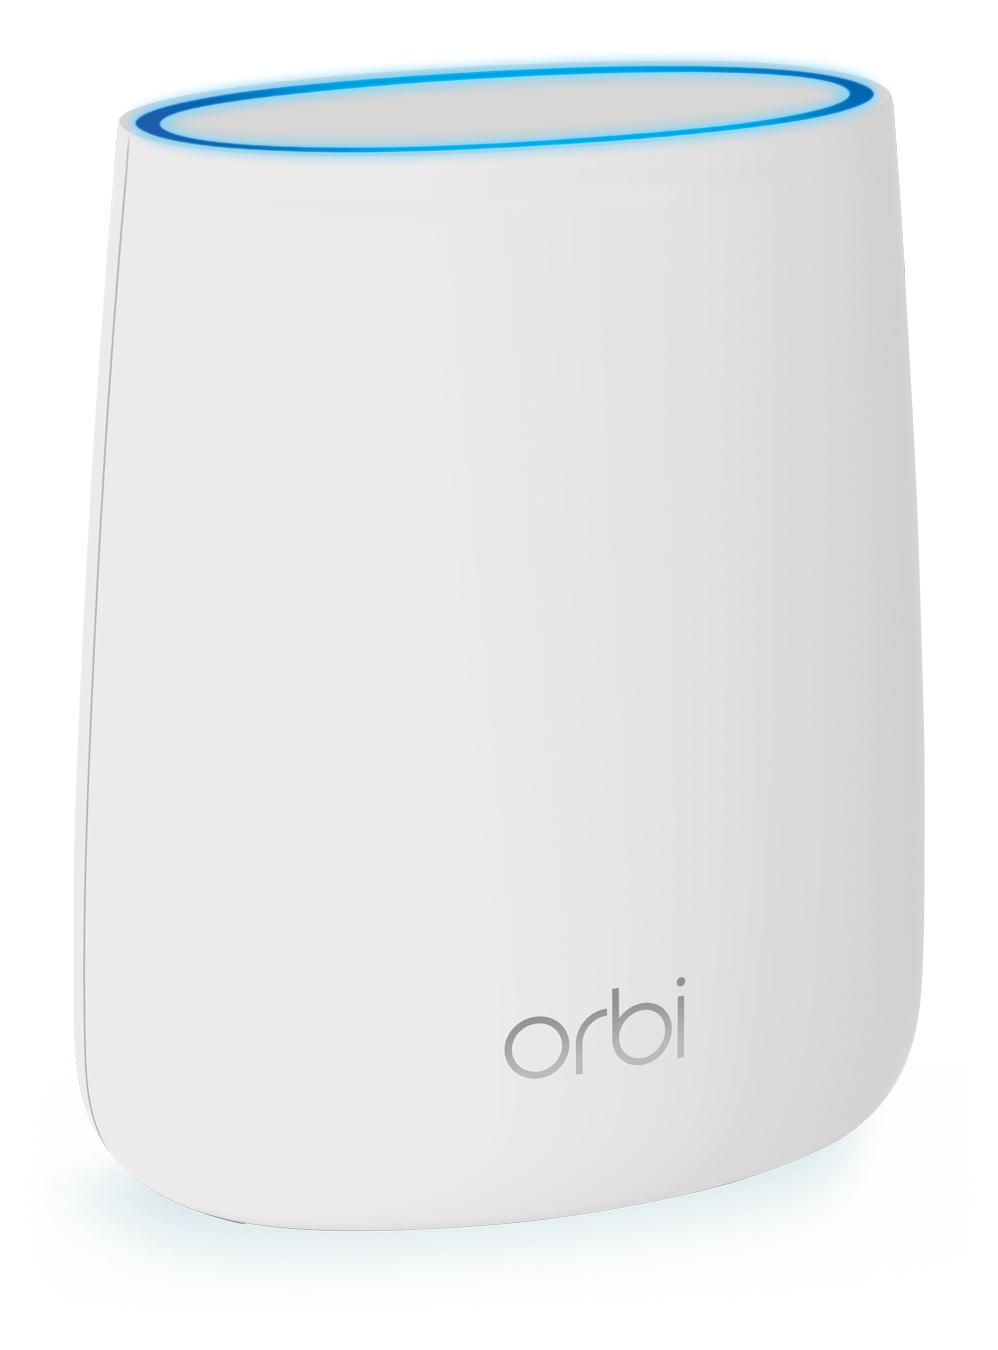 Netgear RBS20 wireless router Tri-band (2.4 GHz / 5 GHz / 5 GHz) Gigabit Ethernet White